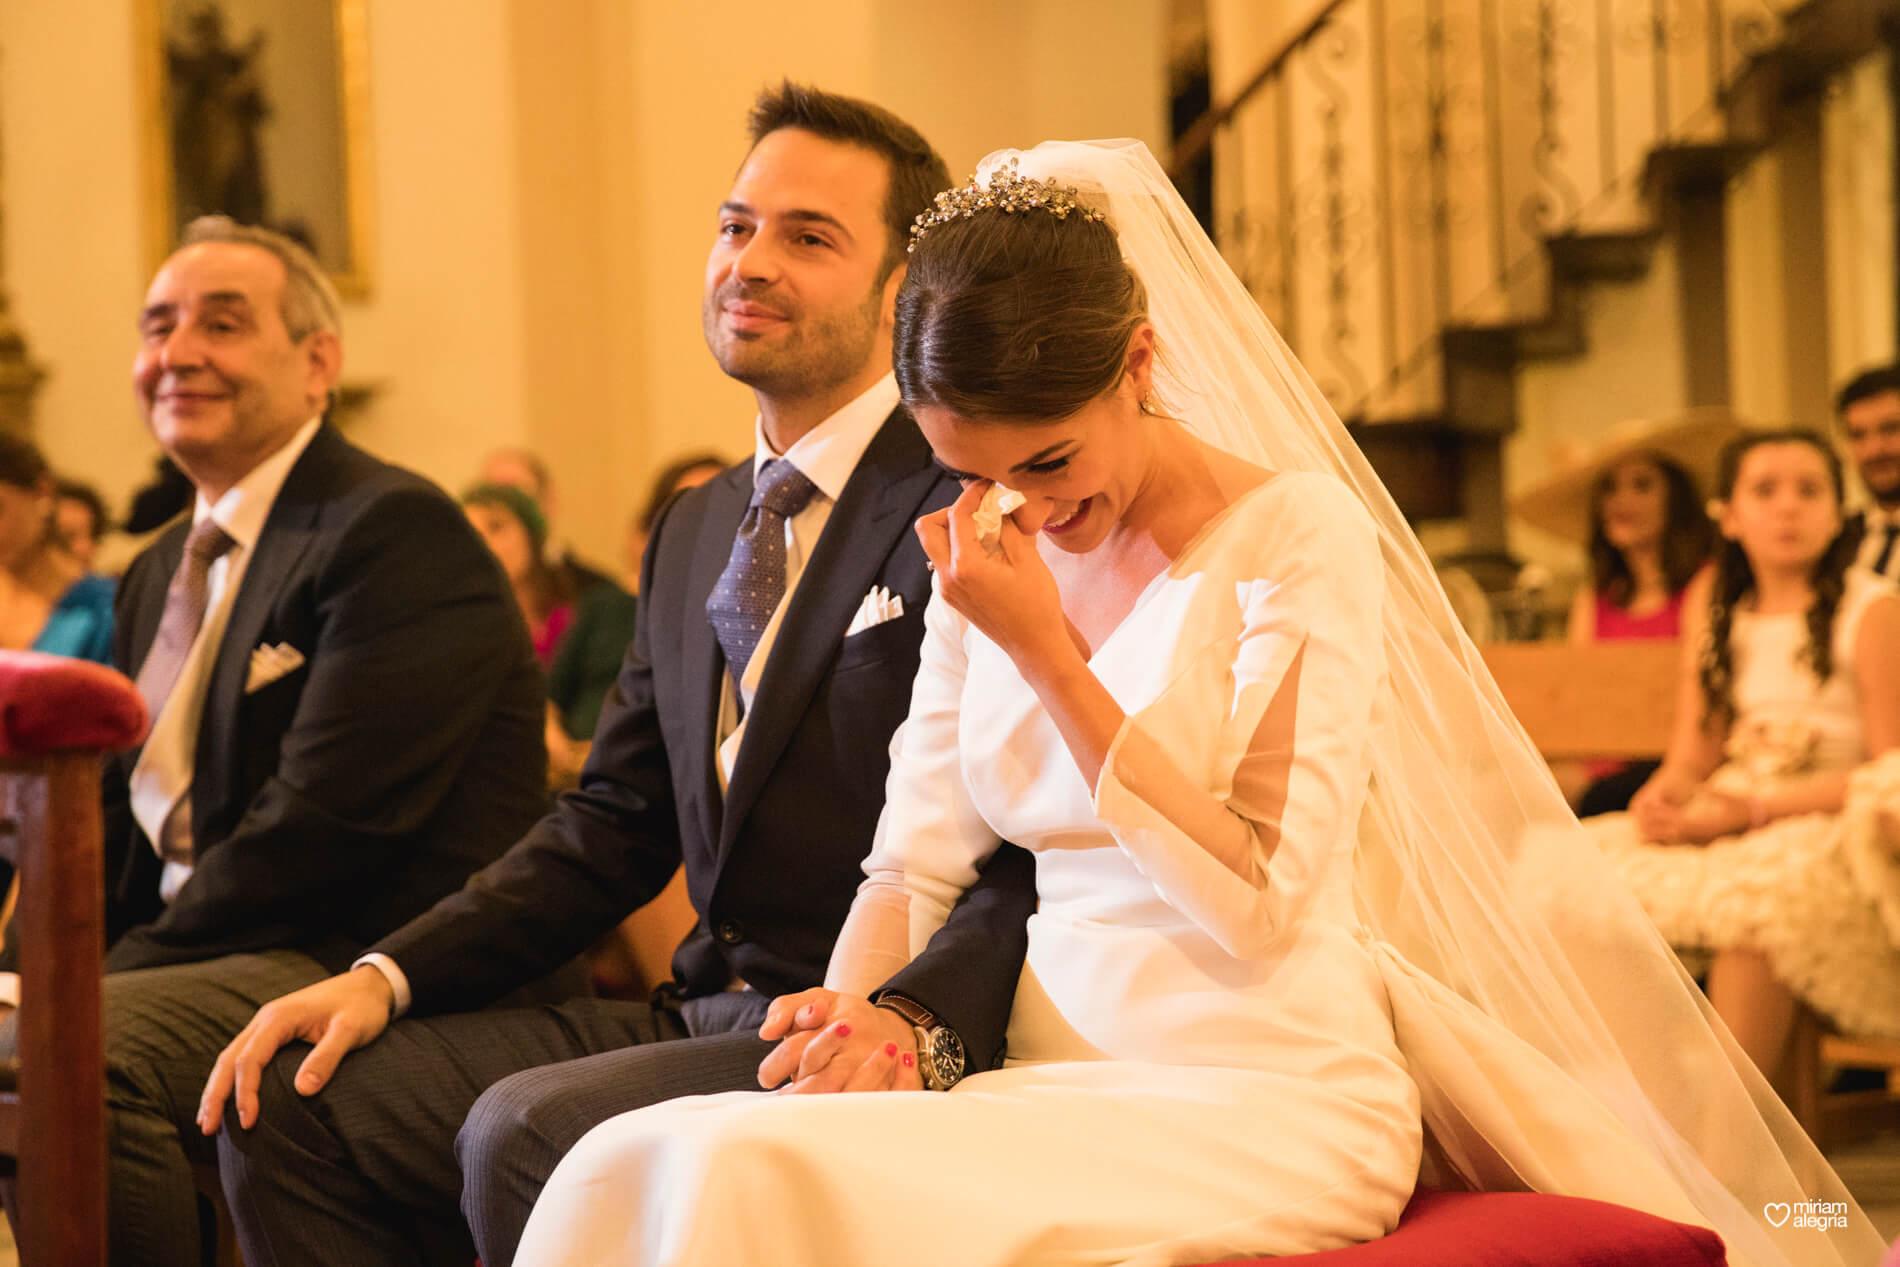 vestido-de-novia-paula-del-vas-miriam-alegria-fotografos-boda-murcia-70